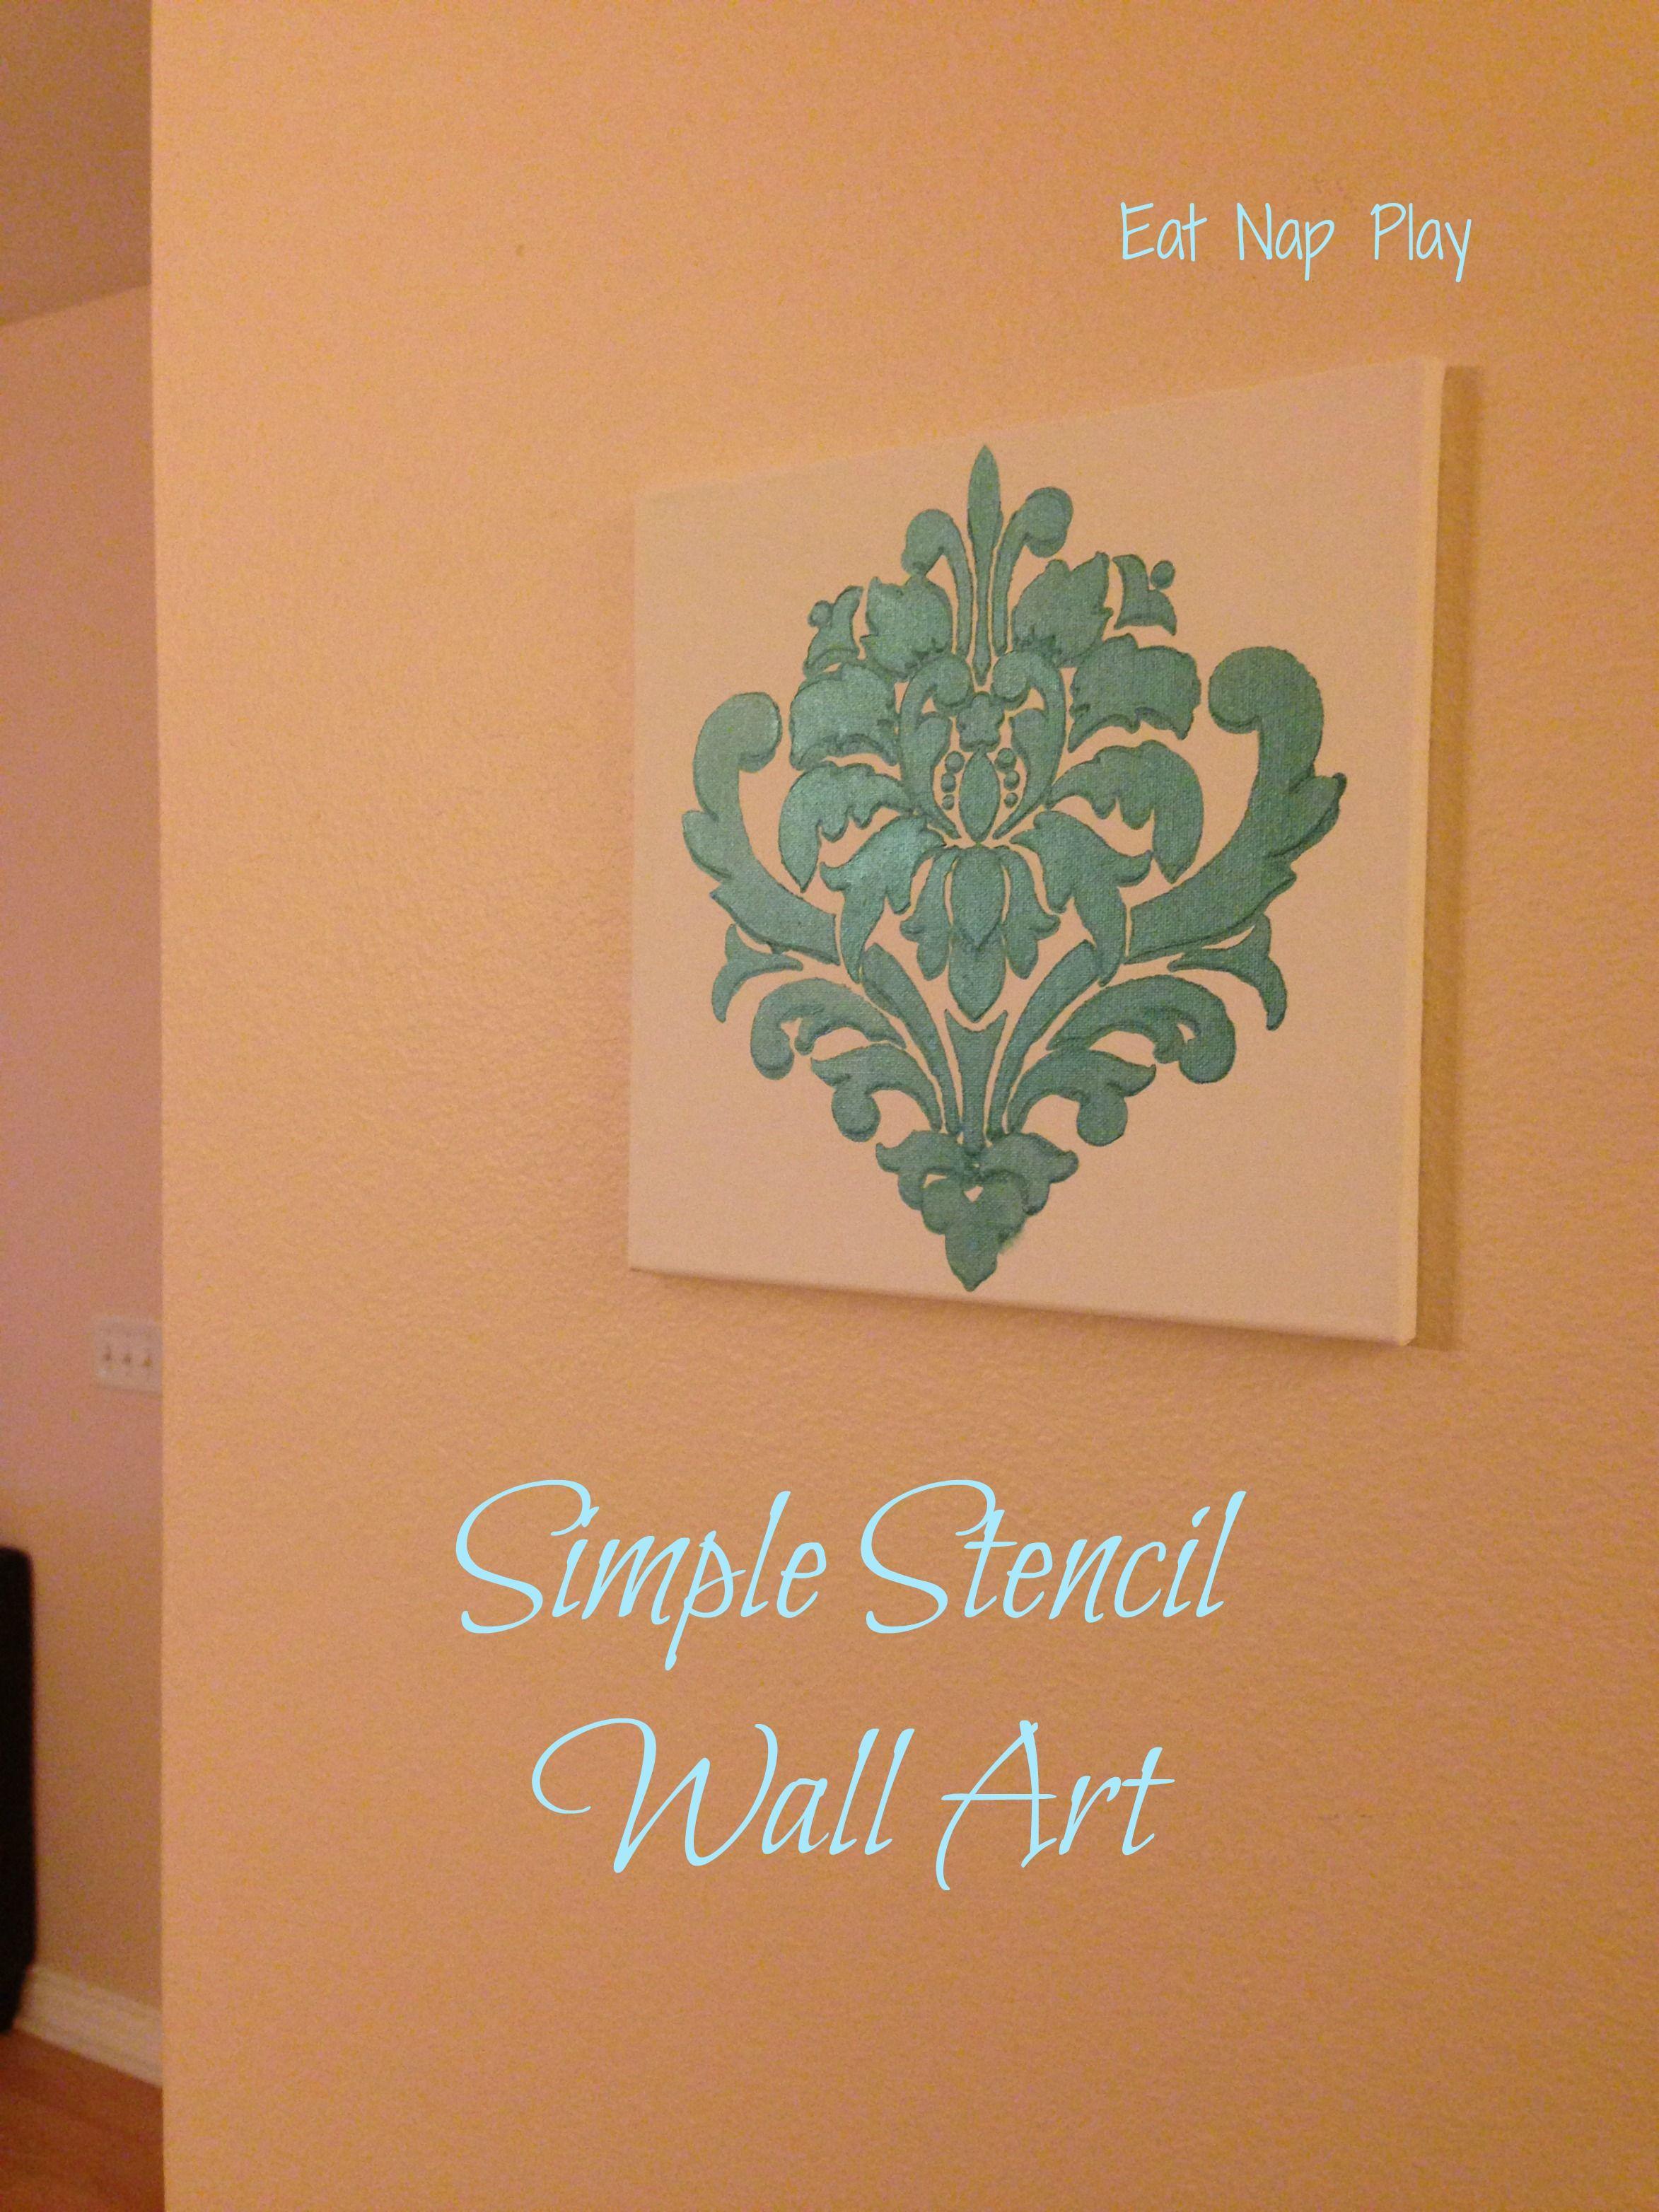 wall-art.jpg (2346×3128)